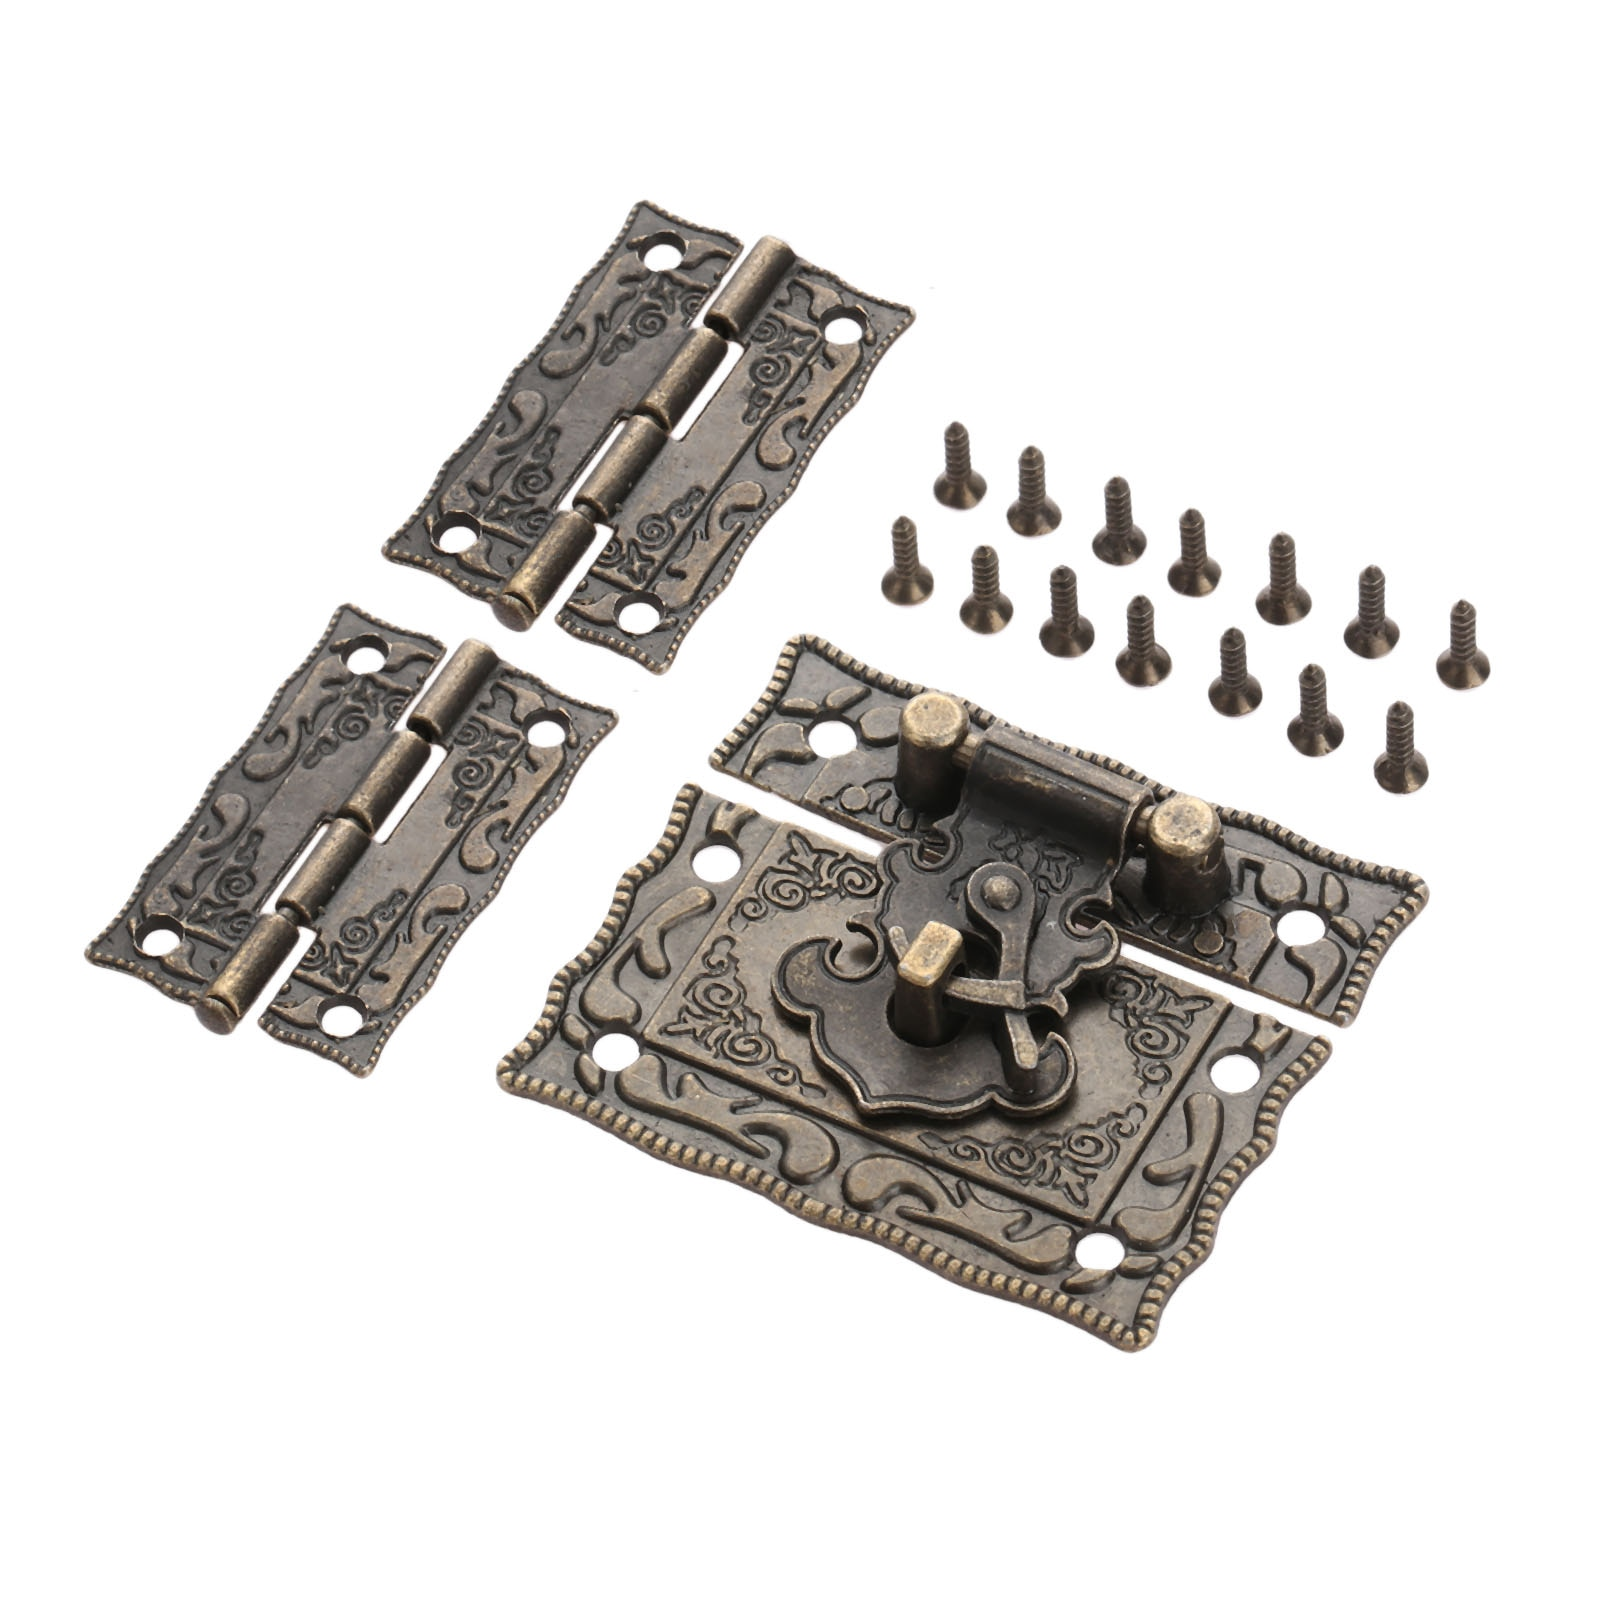 Antique Bronze Padlock Lock Jewelry Wood Box Latch Hasp Clasp +2pcs Suitcase Cabinet Hinge Vintage F